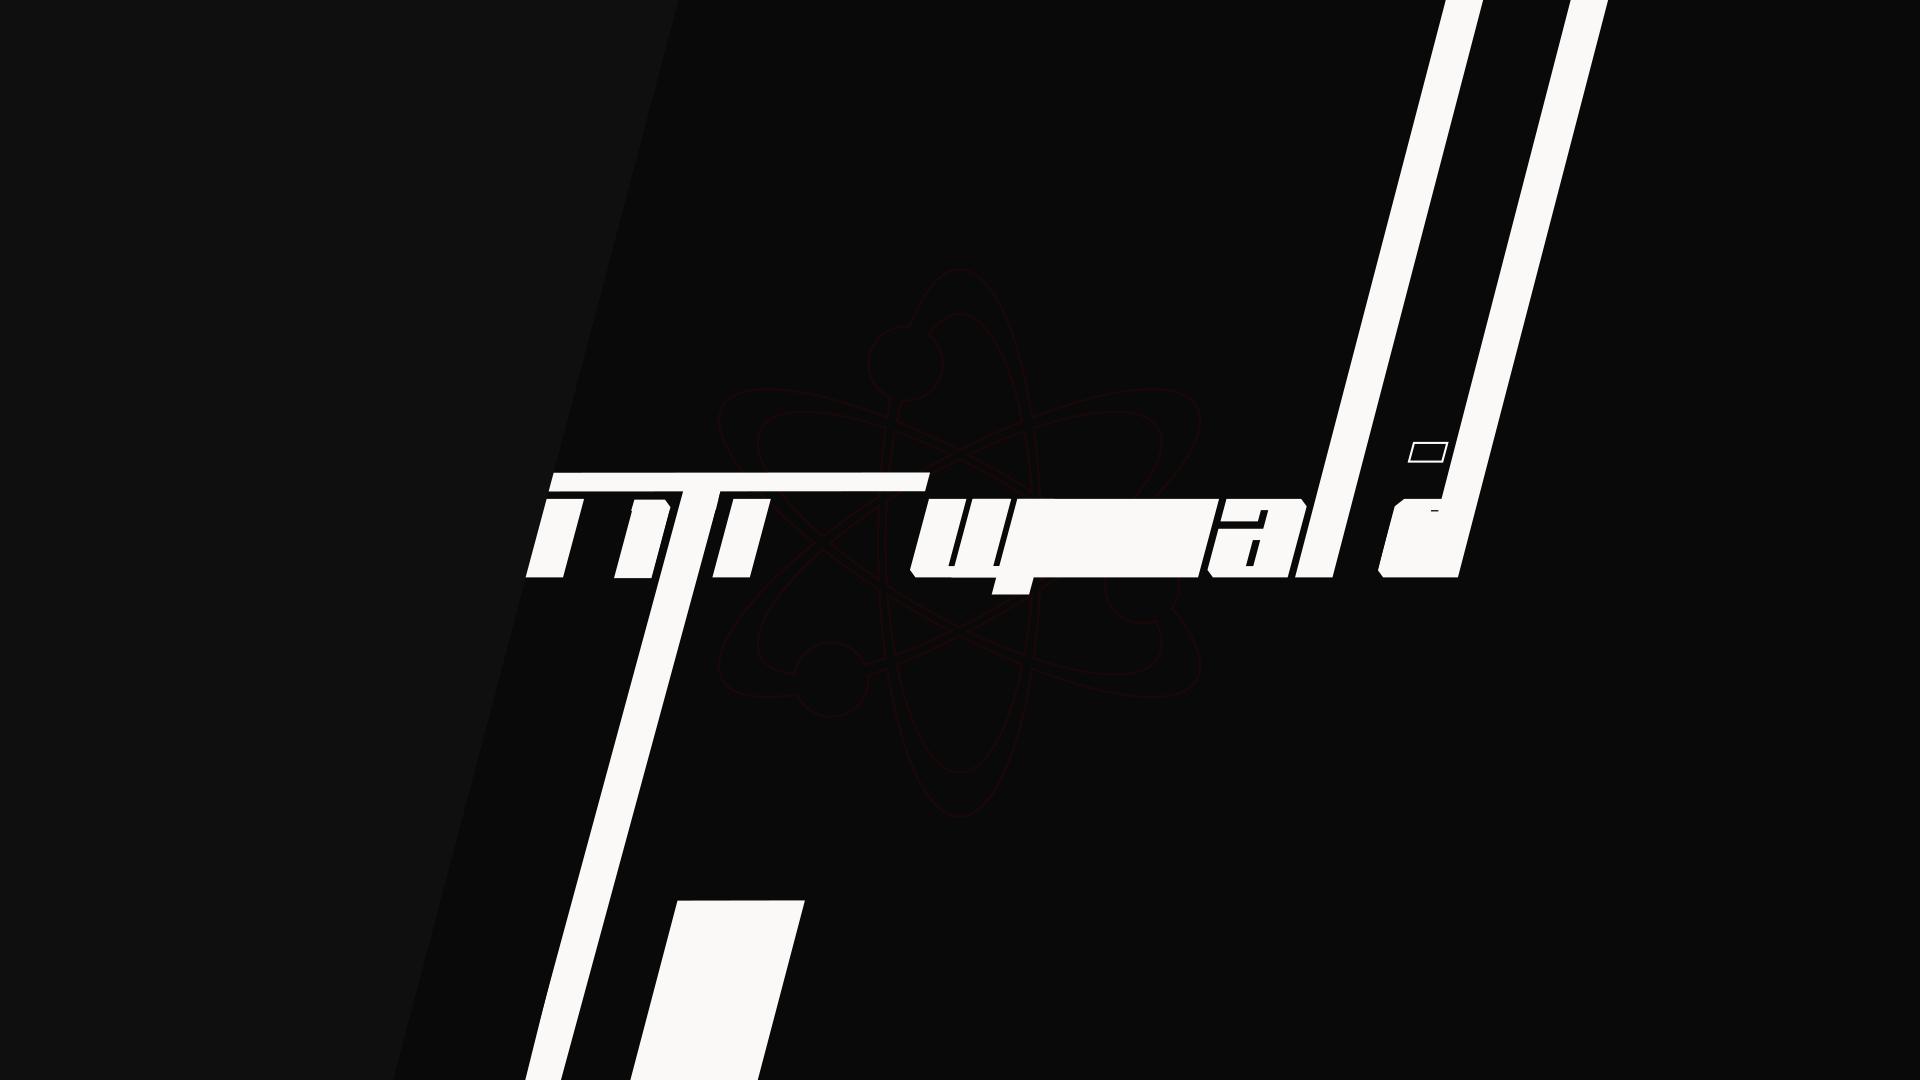 IW_StudioLogo_Anim_v006_00110.png